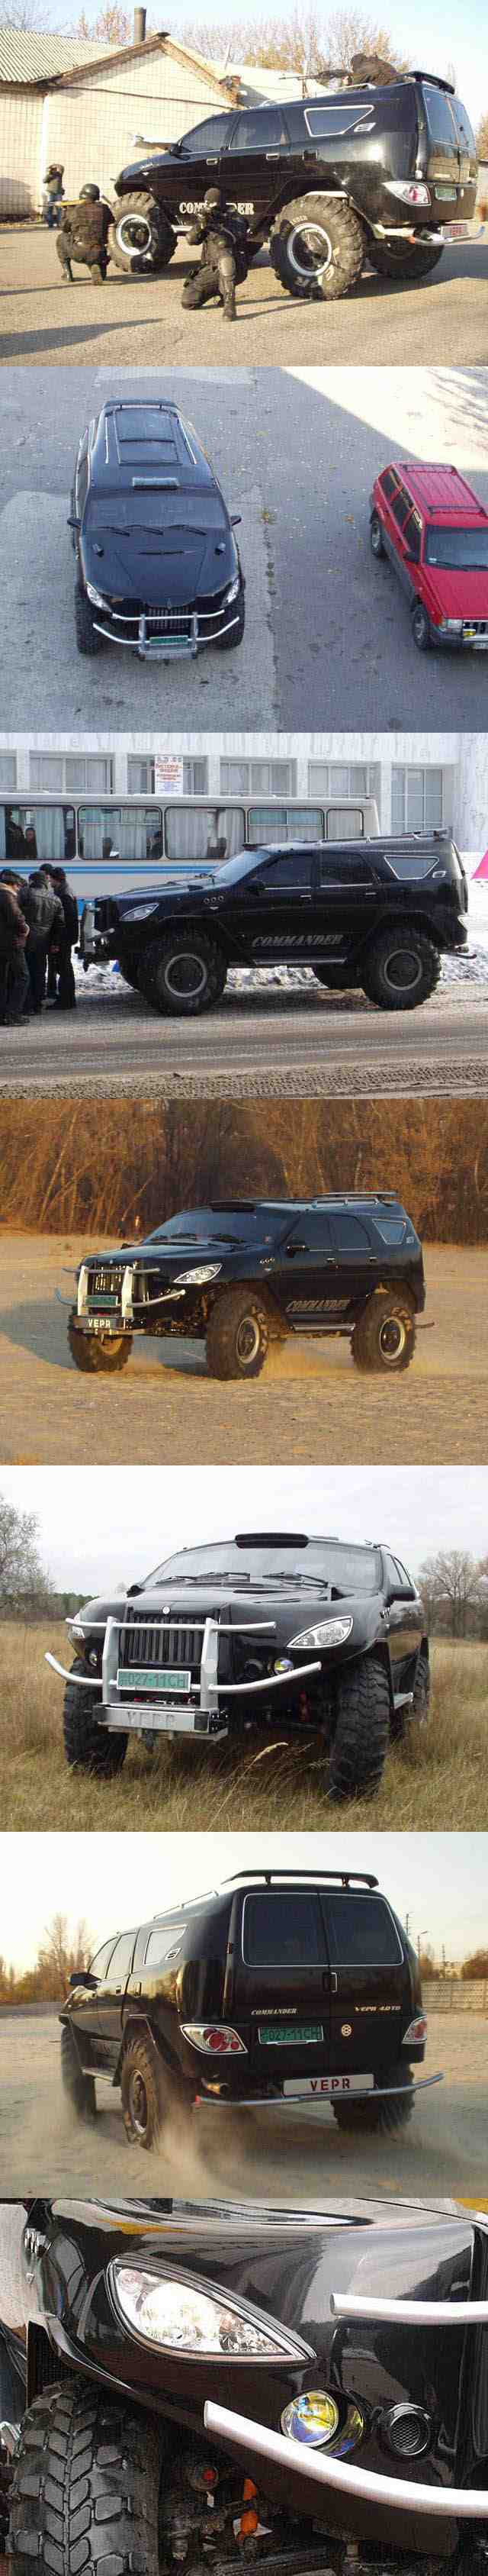 Ukraine Hummer